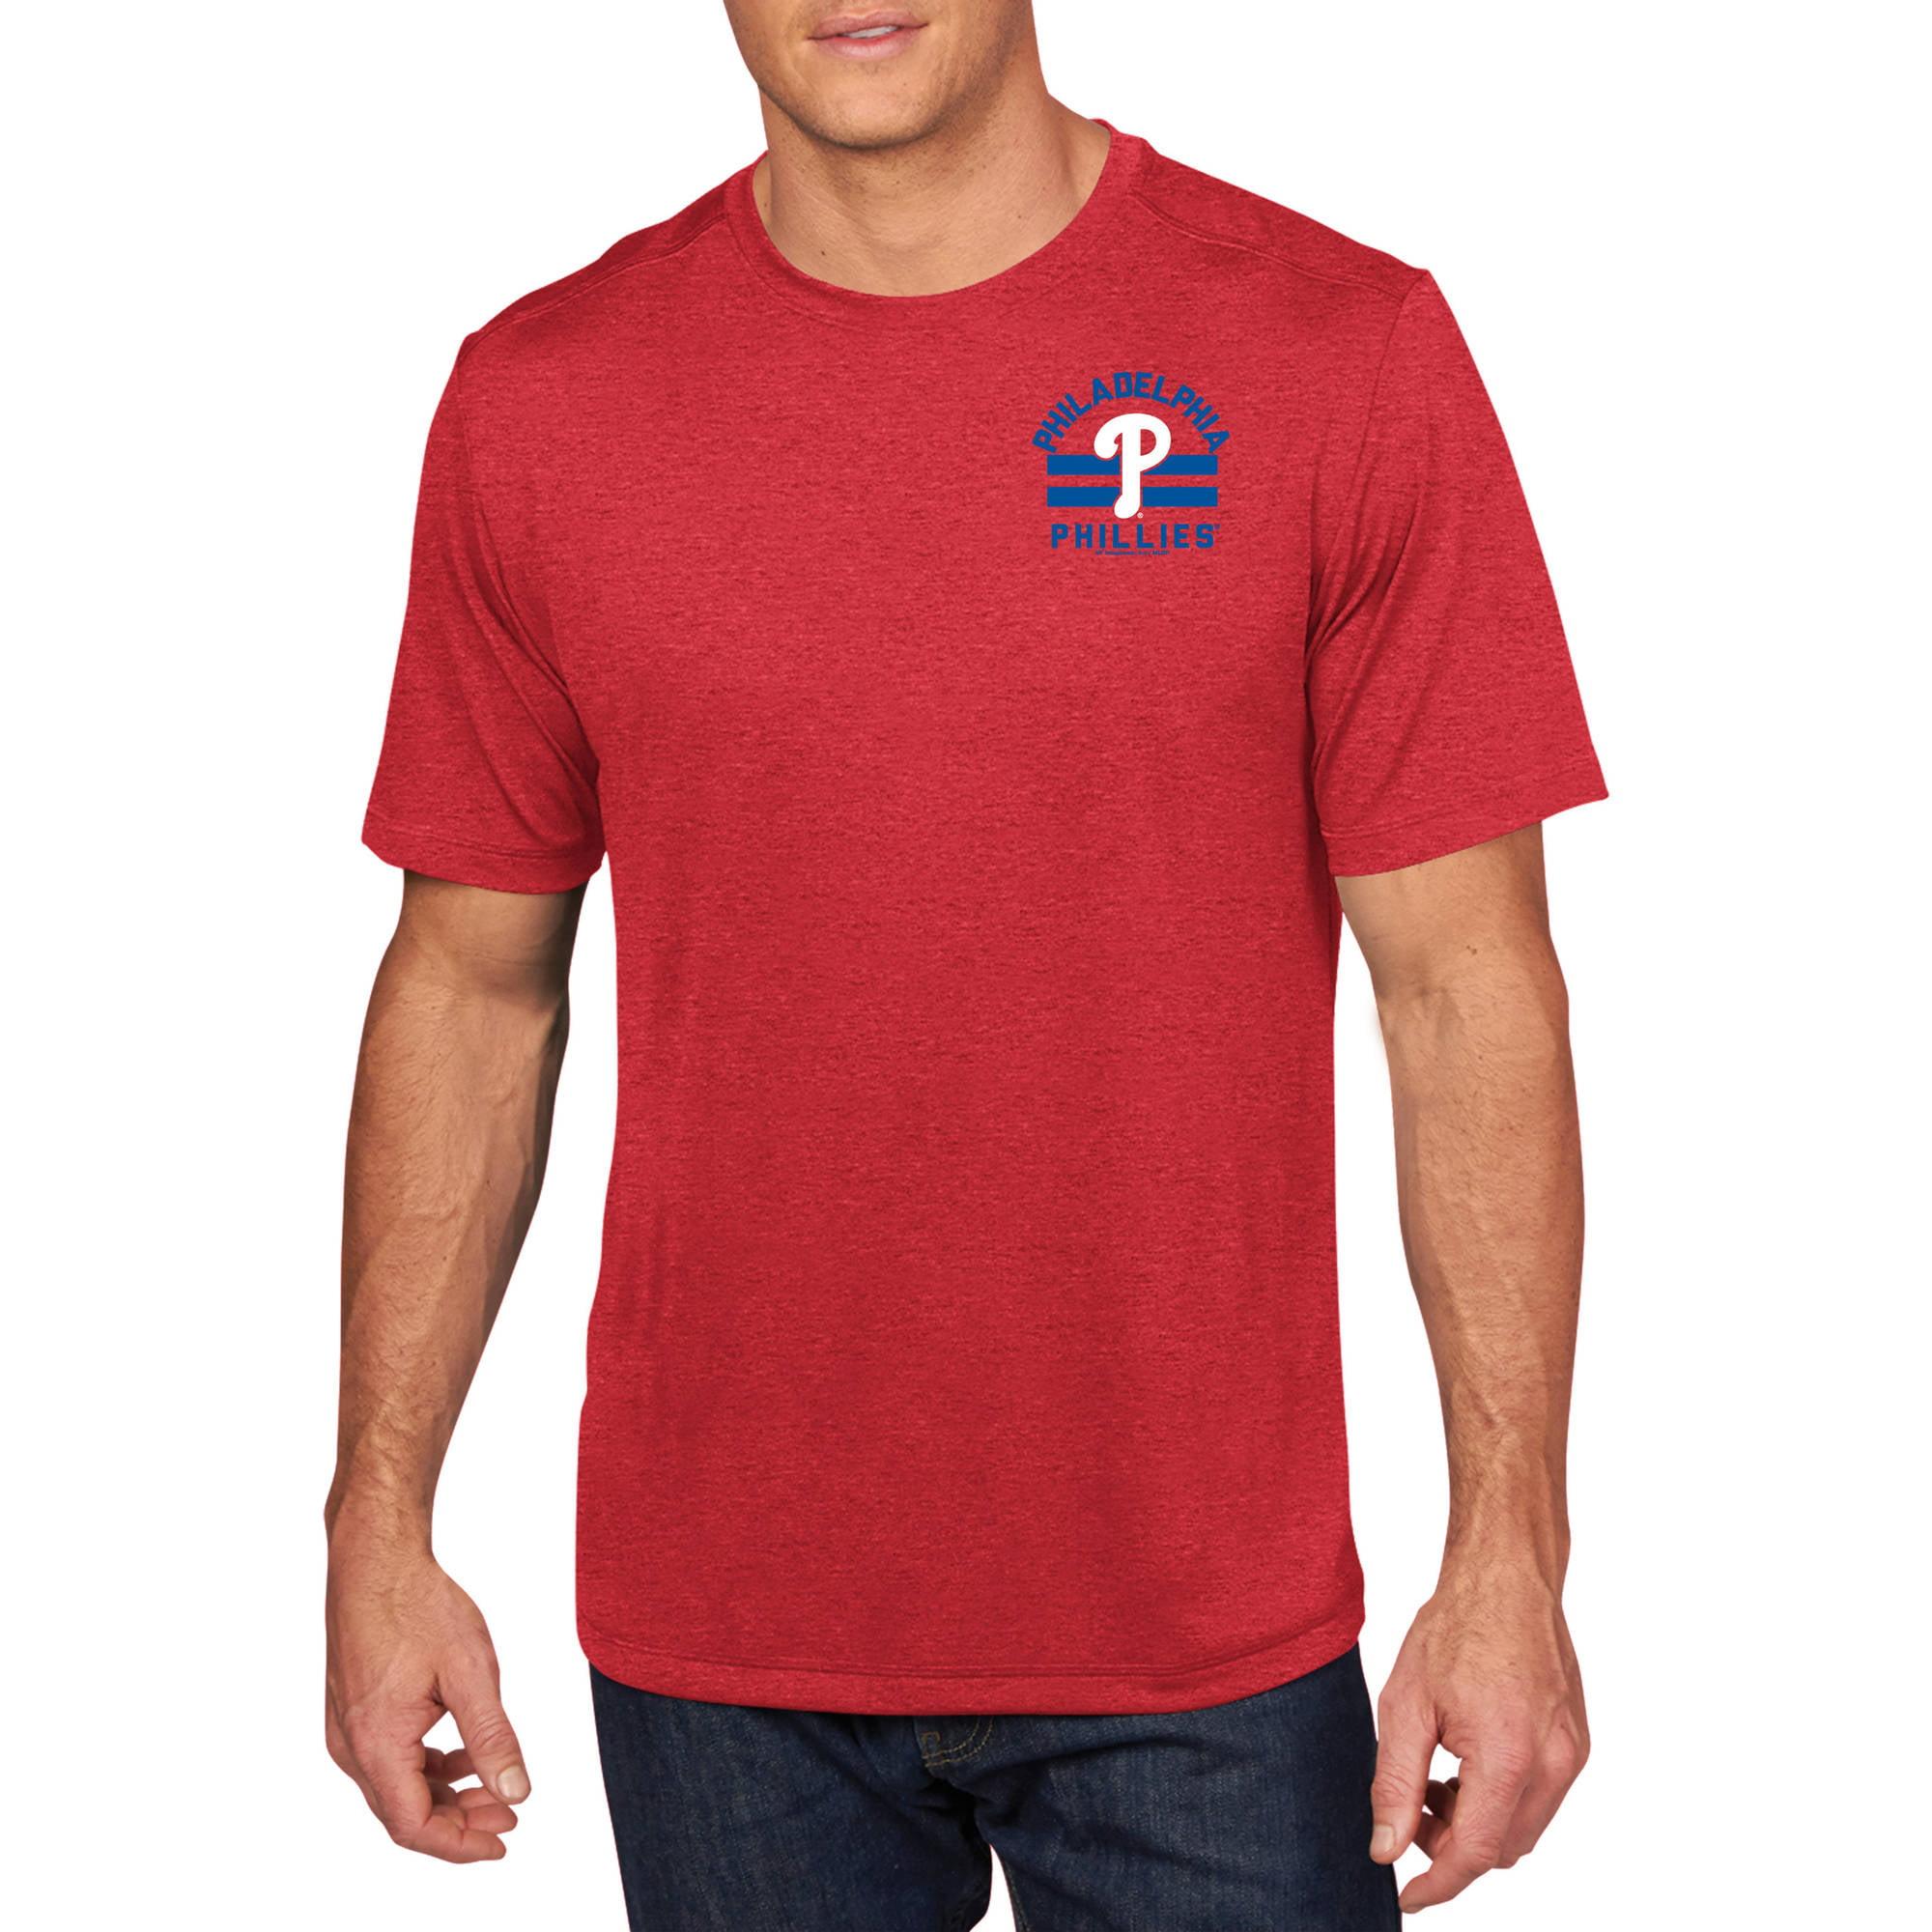 MLB - Big Mens Philadelphia Phillies Short Sleeve Synthetic Team Tee